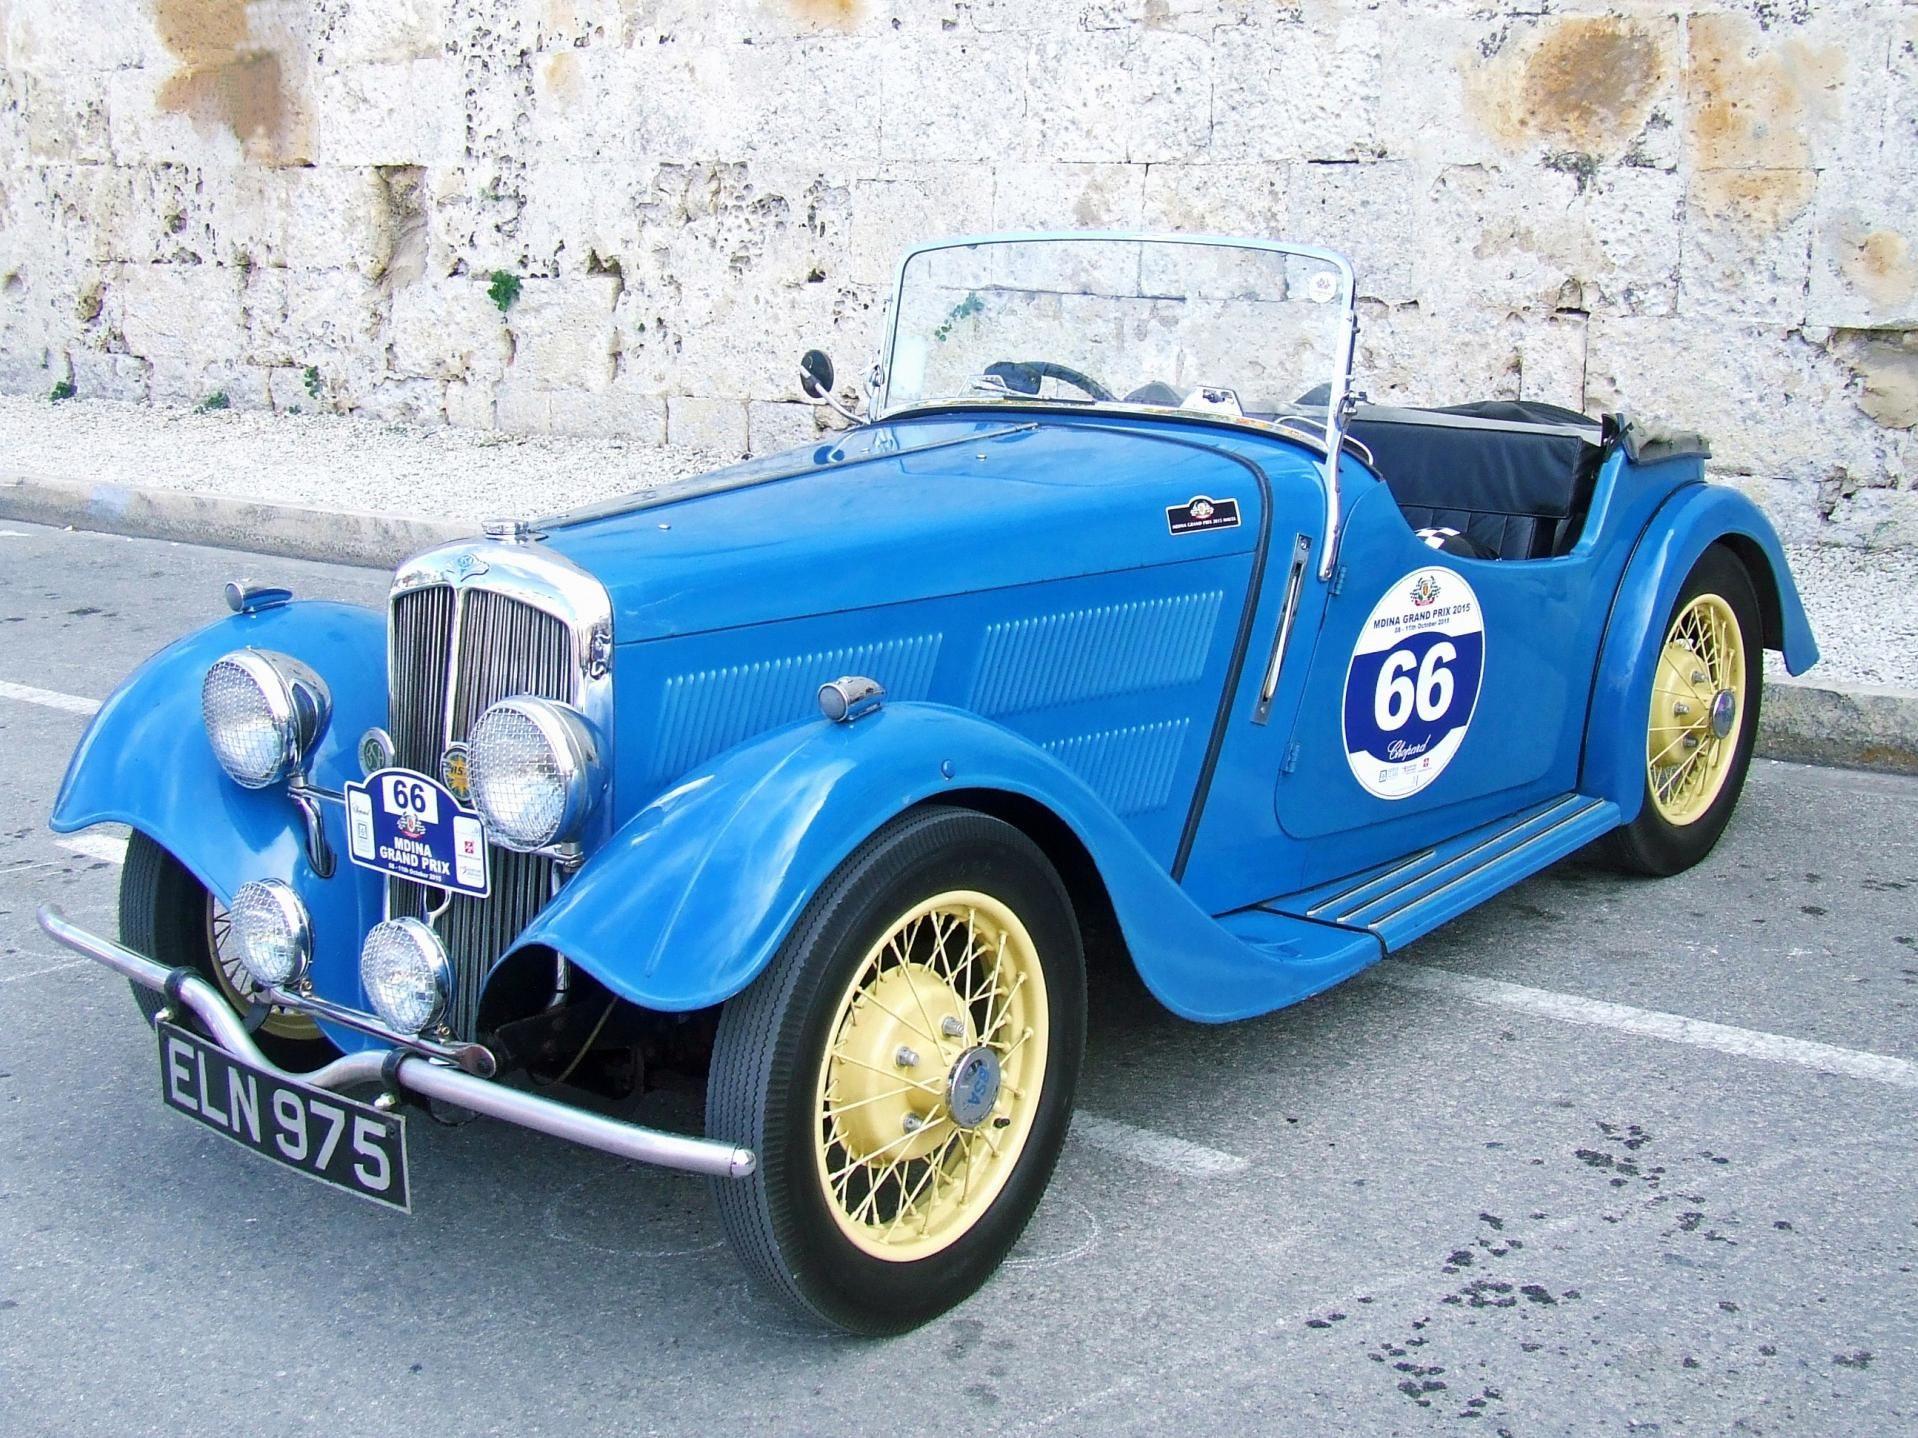 Nada Classic Car Value >> Powerful Nada Classic Car Values Classicar Vintagecar Classic